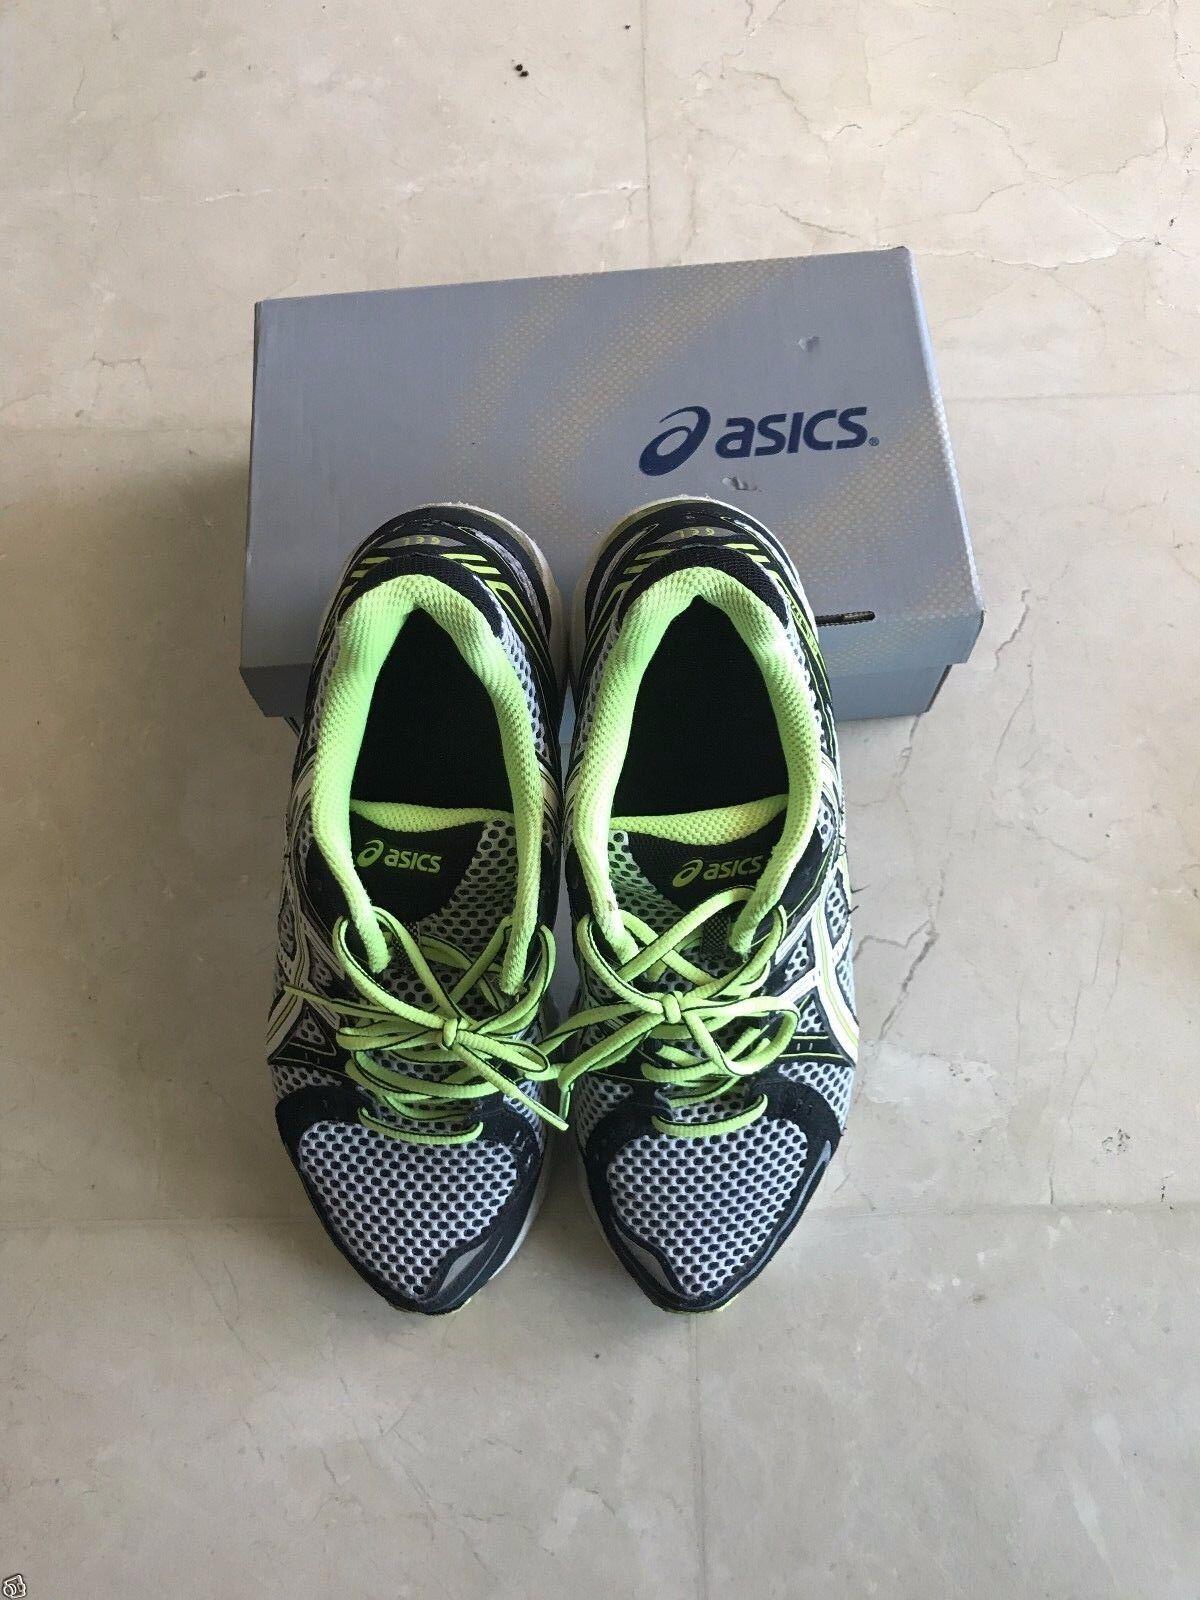 Asics BLACK GREEN Gel 1170 Sneaker Premium Cushioned Running Sneaker 1170 e452f4